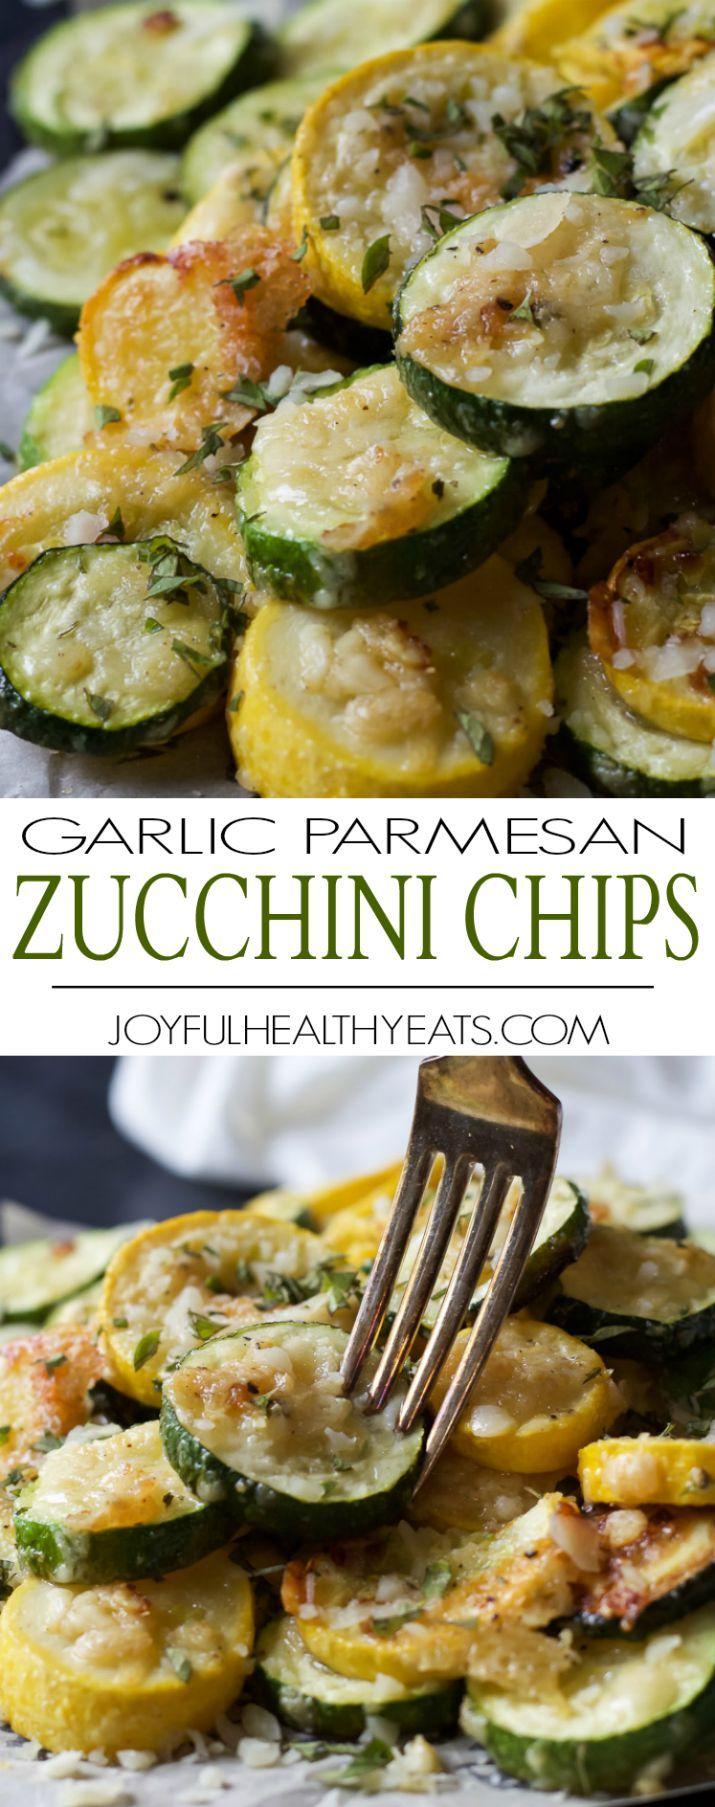 Photo of Crispy Garlic Parmesan Zucchini Chips | Healthy Appetizer Recipe